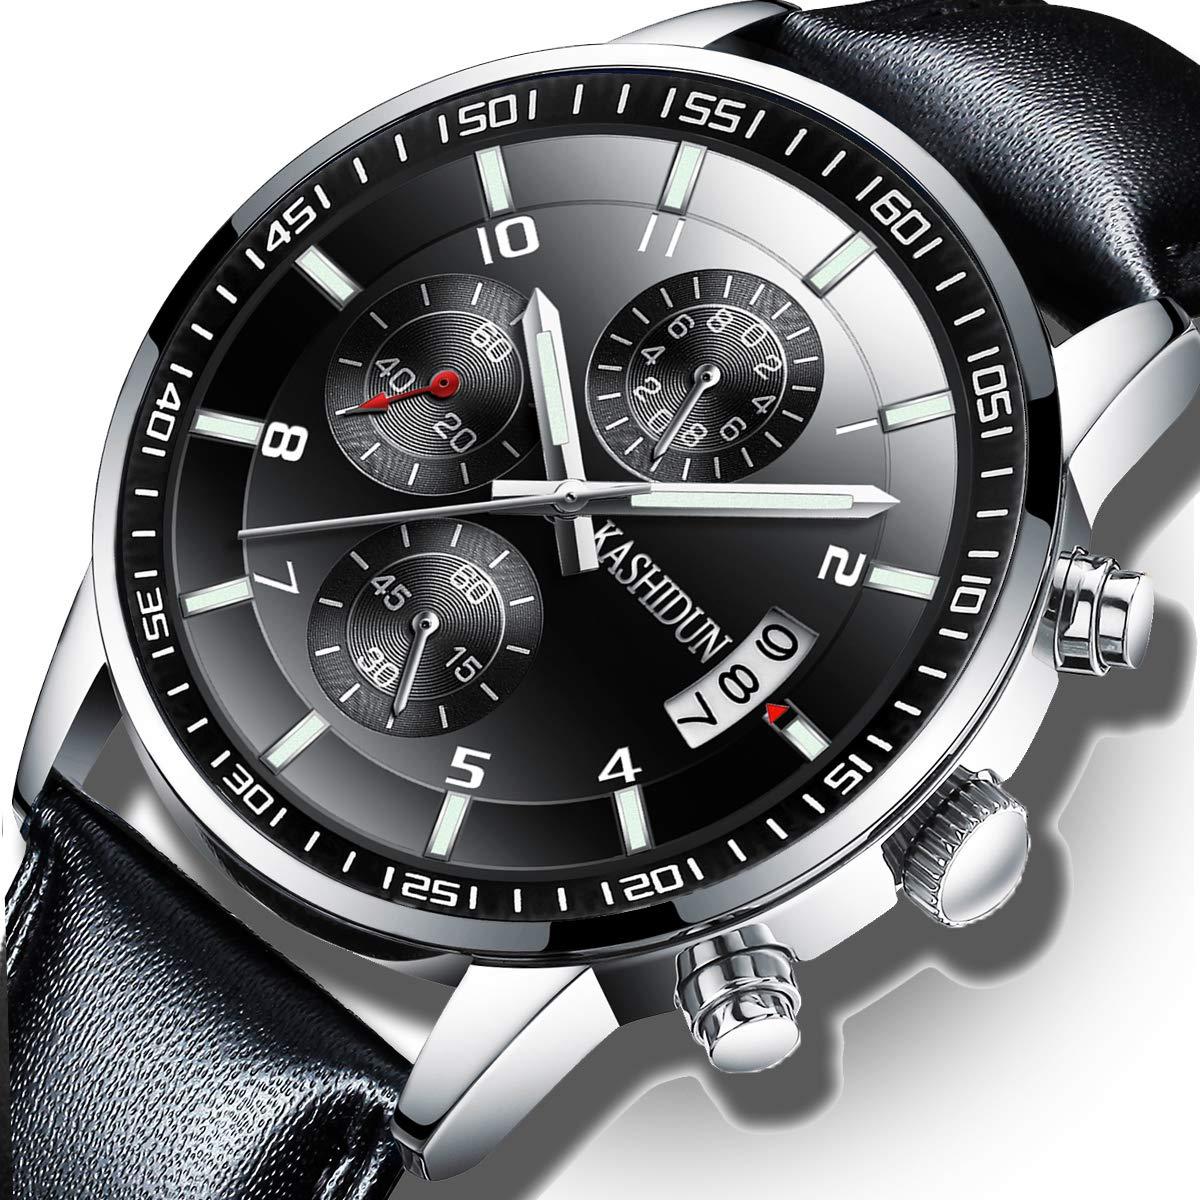 KASHIDUN Men's Watches Luxury Sports Military Quartz Wristwatches Waterproof Chronograph Leather Strap Black Color